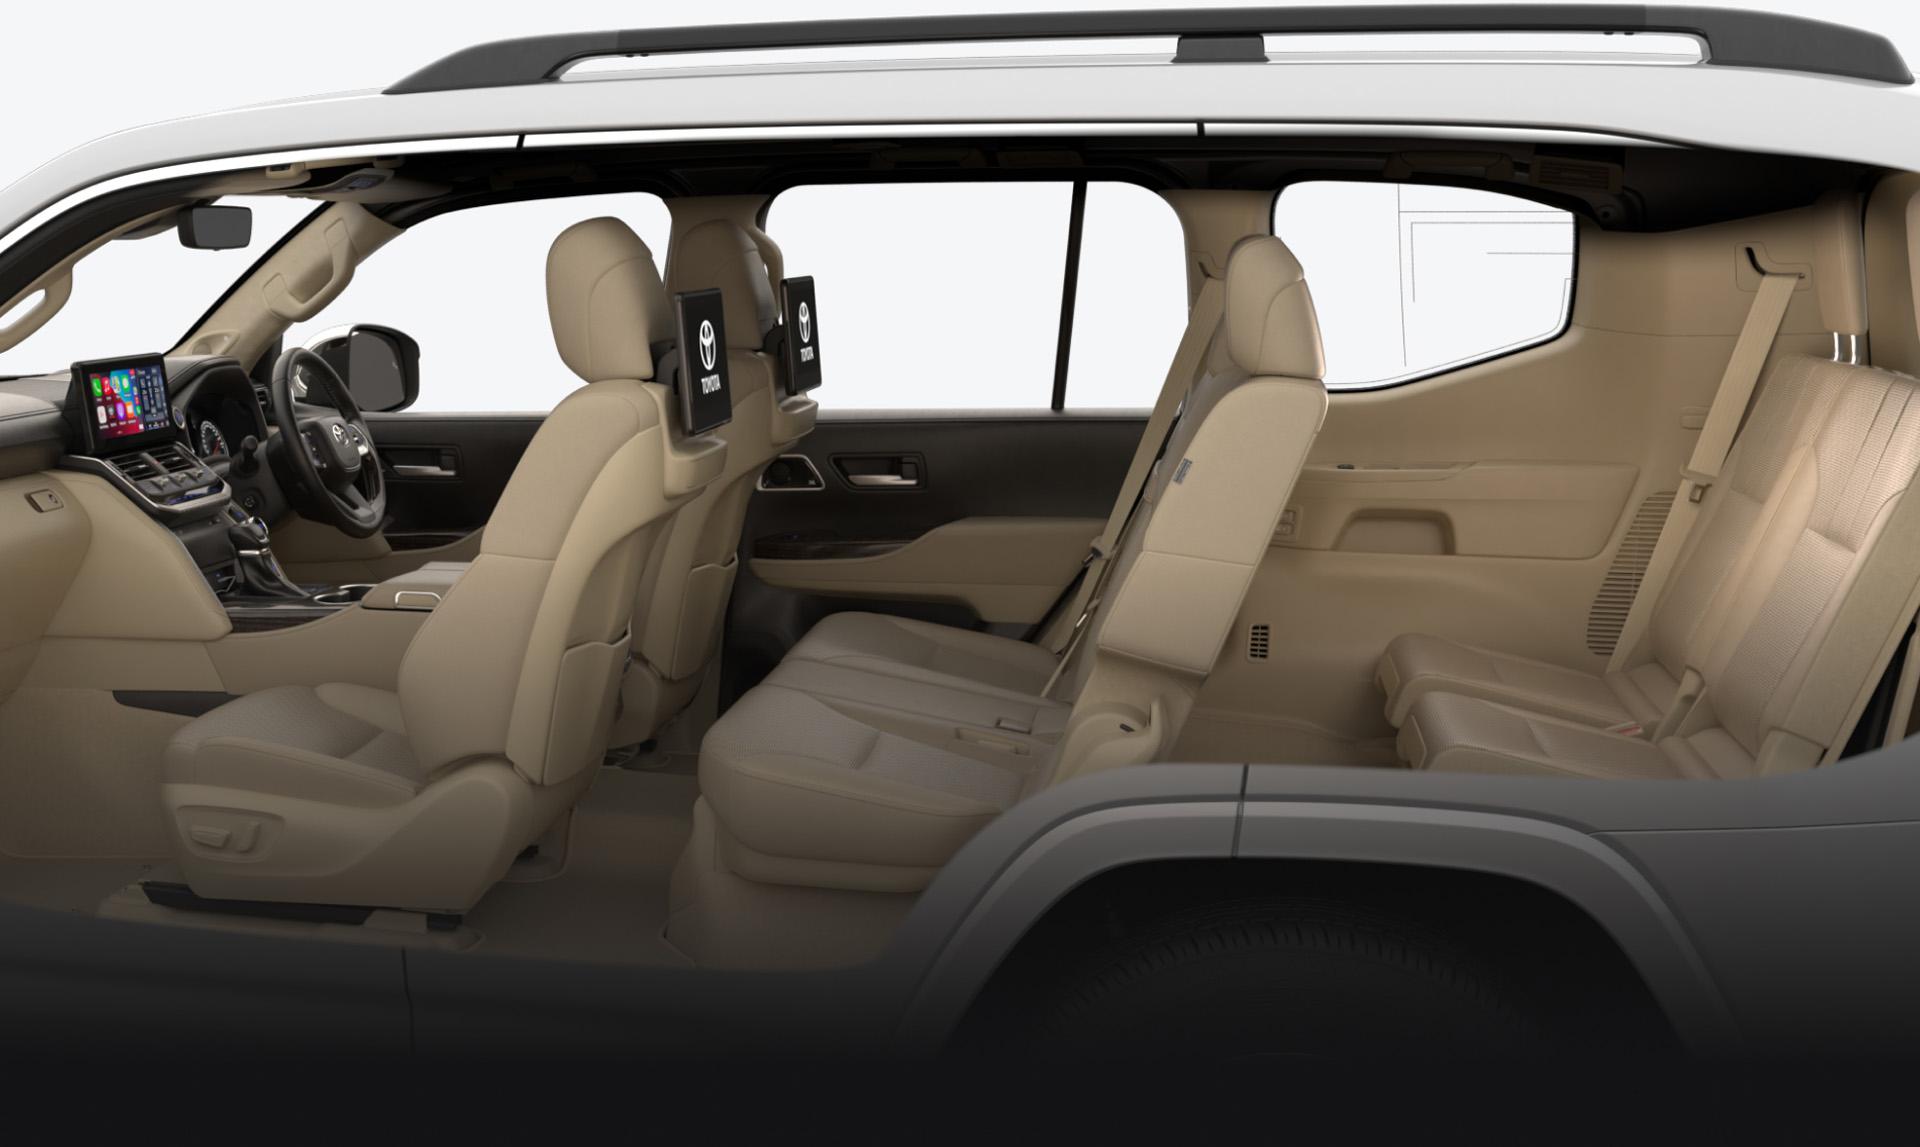 LandCruiser 300 Interior